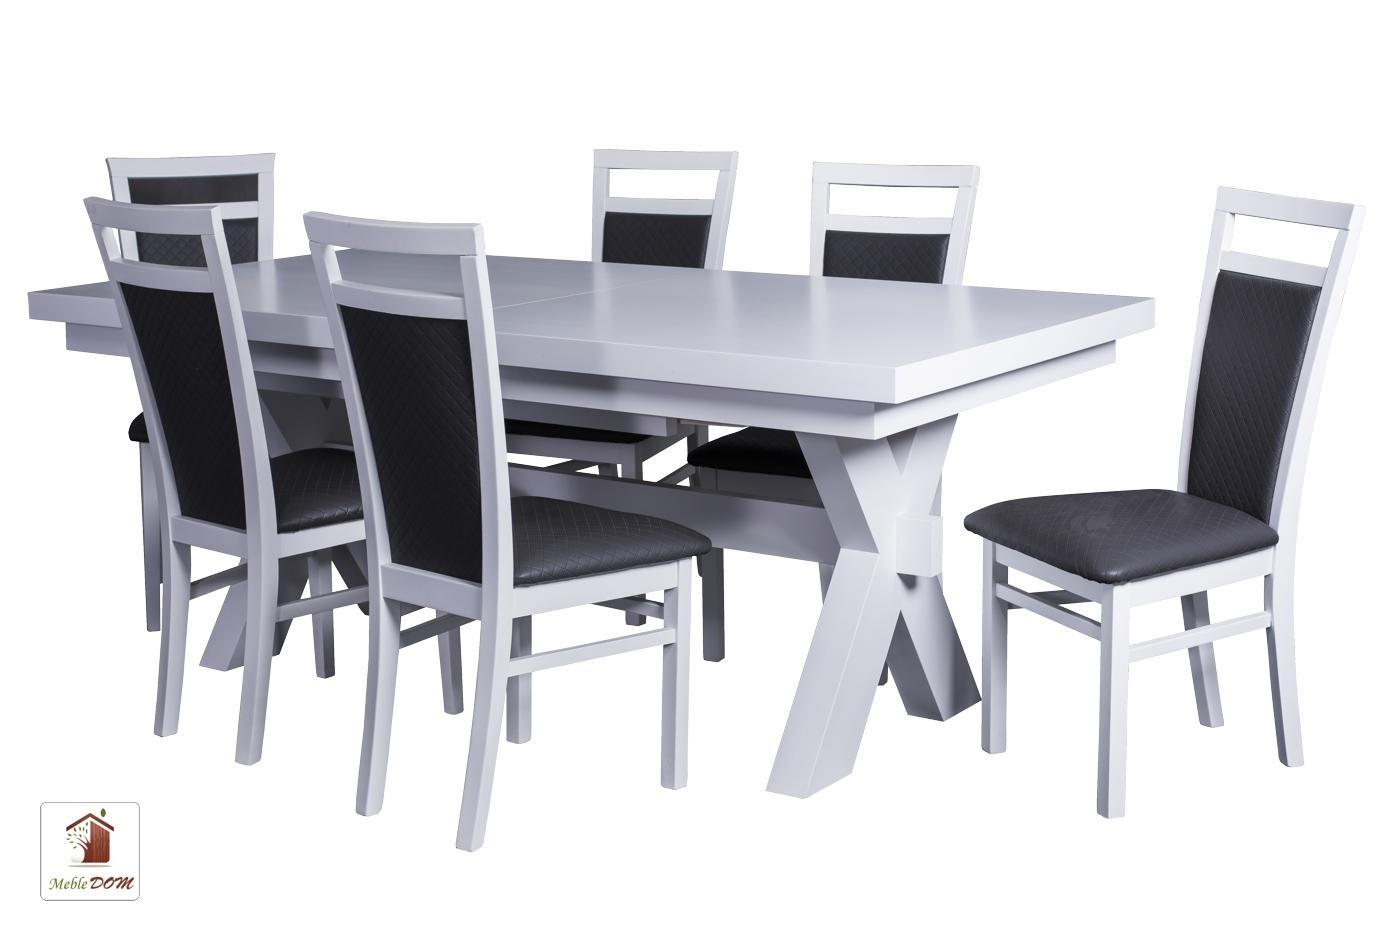 Prostokątny stół rozkładany Malmo z krzesłami Paloma